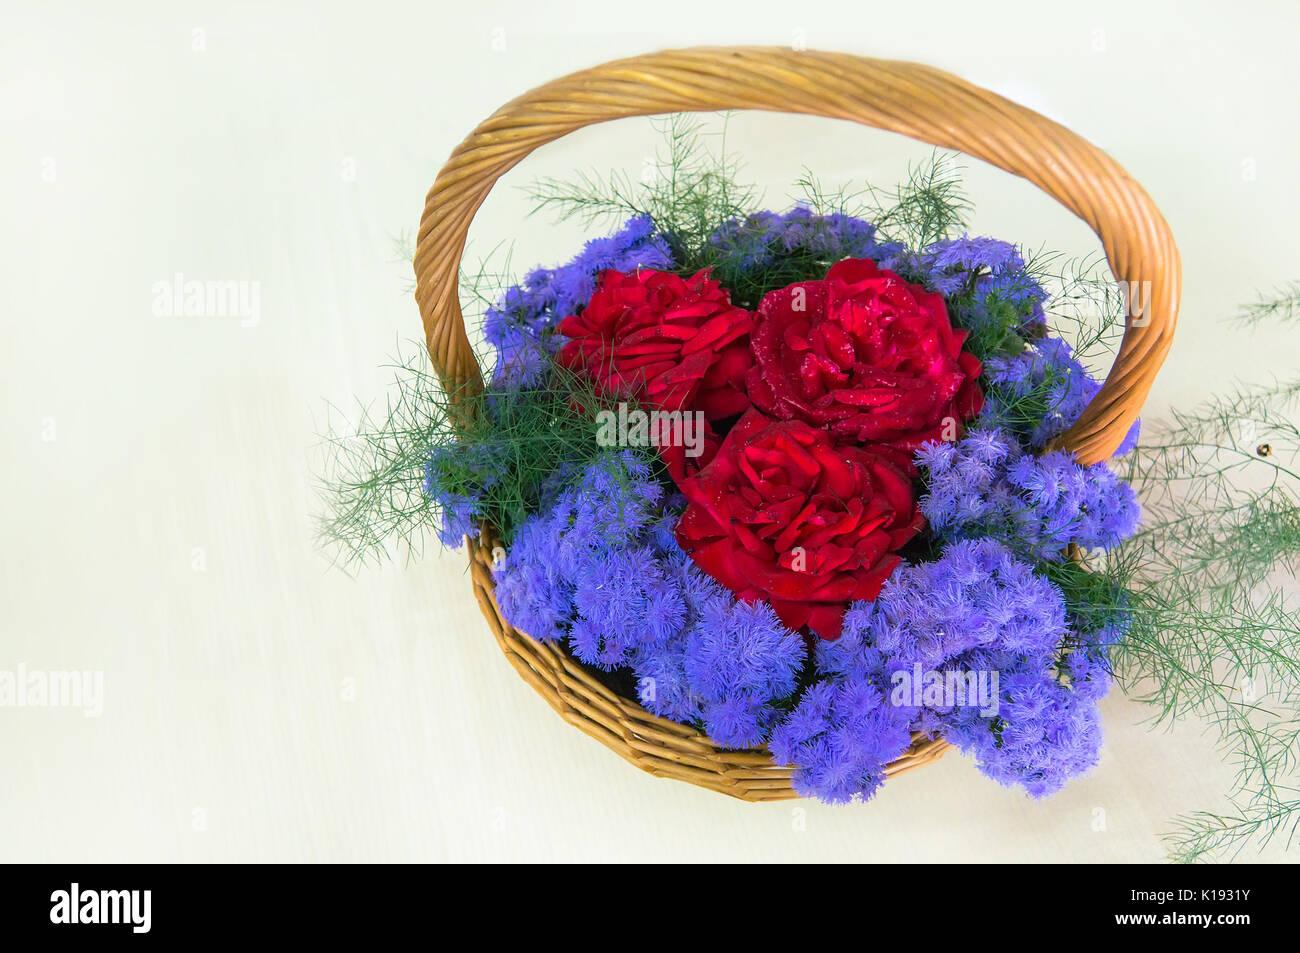 Precioso Ramo De 3 Rosas Rojas Grande Rodeada De Flores Azules En